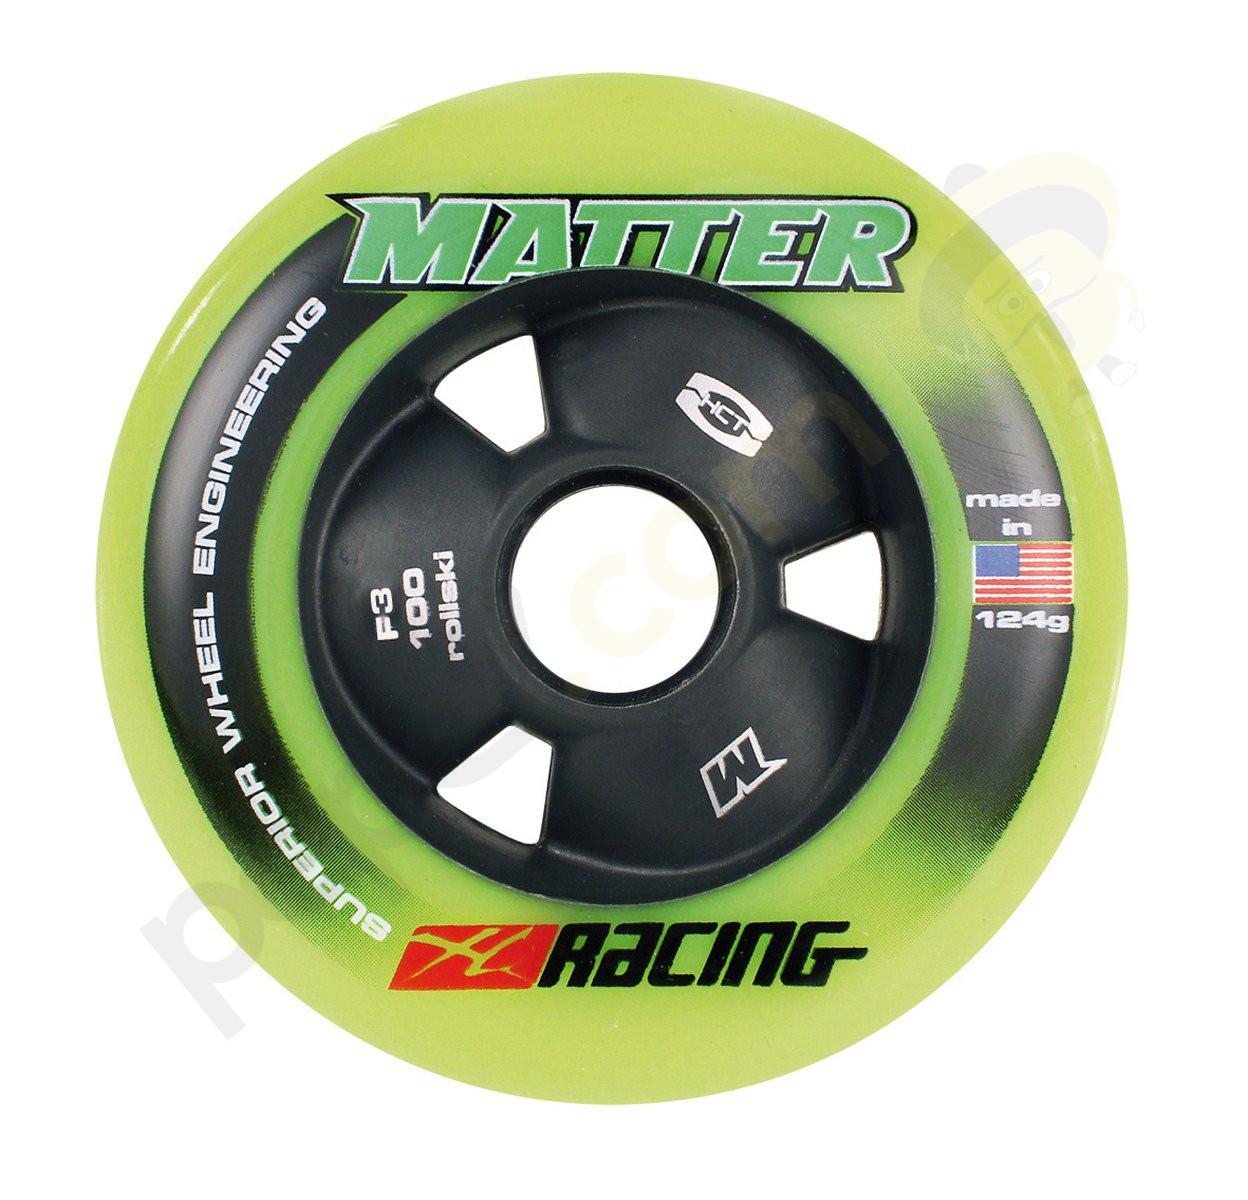 Powerslide Forum: Powerslide Nordic Matter XC Racing Wheel 20500 (4 Pcs